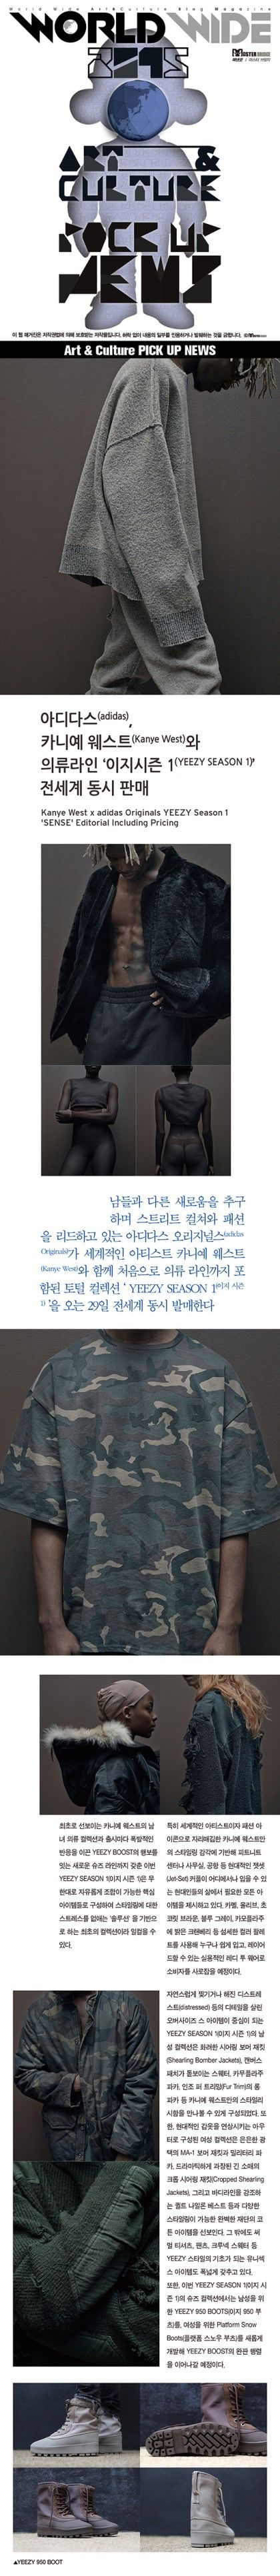 Blog Magazine ● WORLD WIDE: Art & Culture PICK UP NEWS∥아디다스(adidas), 카니예 웨스트(Kanye West)와 의류라인'이지시즌 1(YEEZY SEASON 1)'전세계 동시 판매 : 네이버 블로그